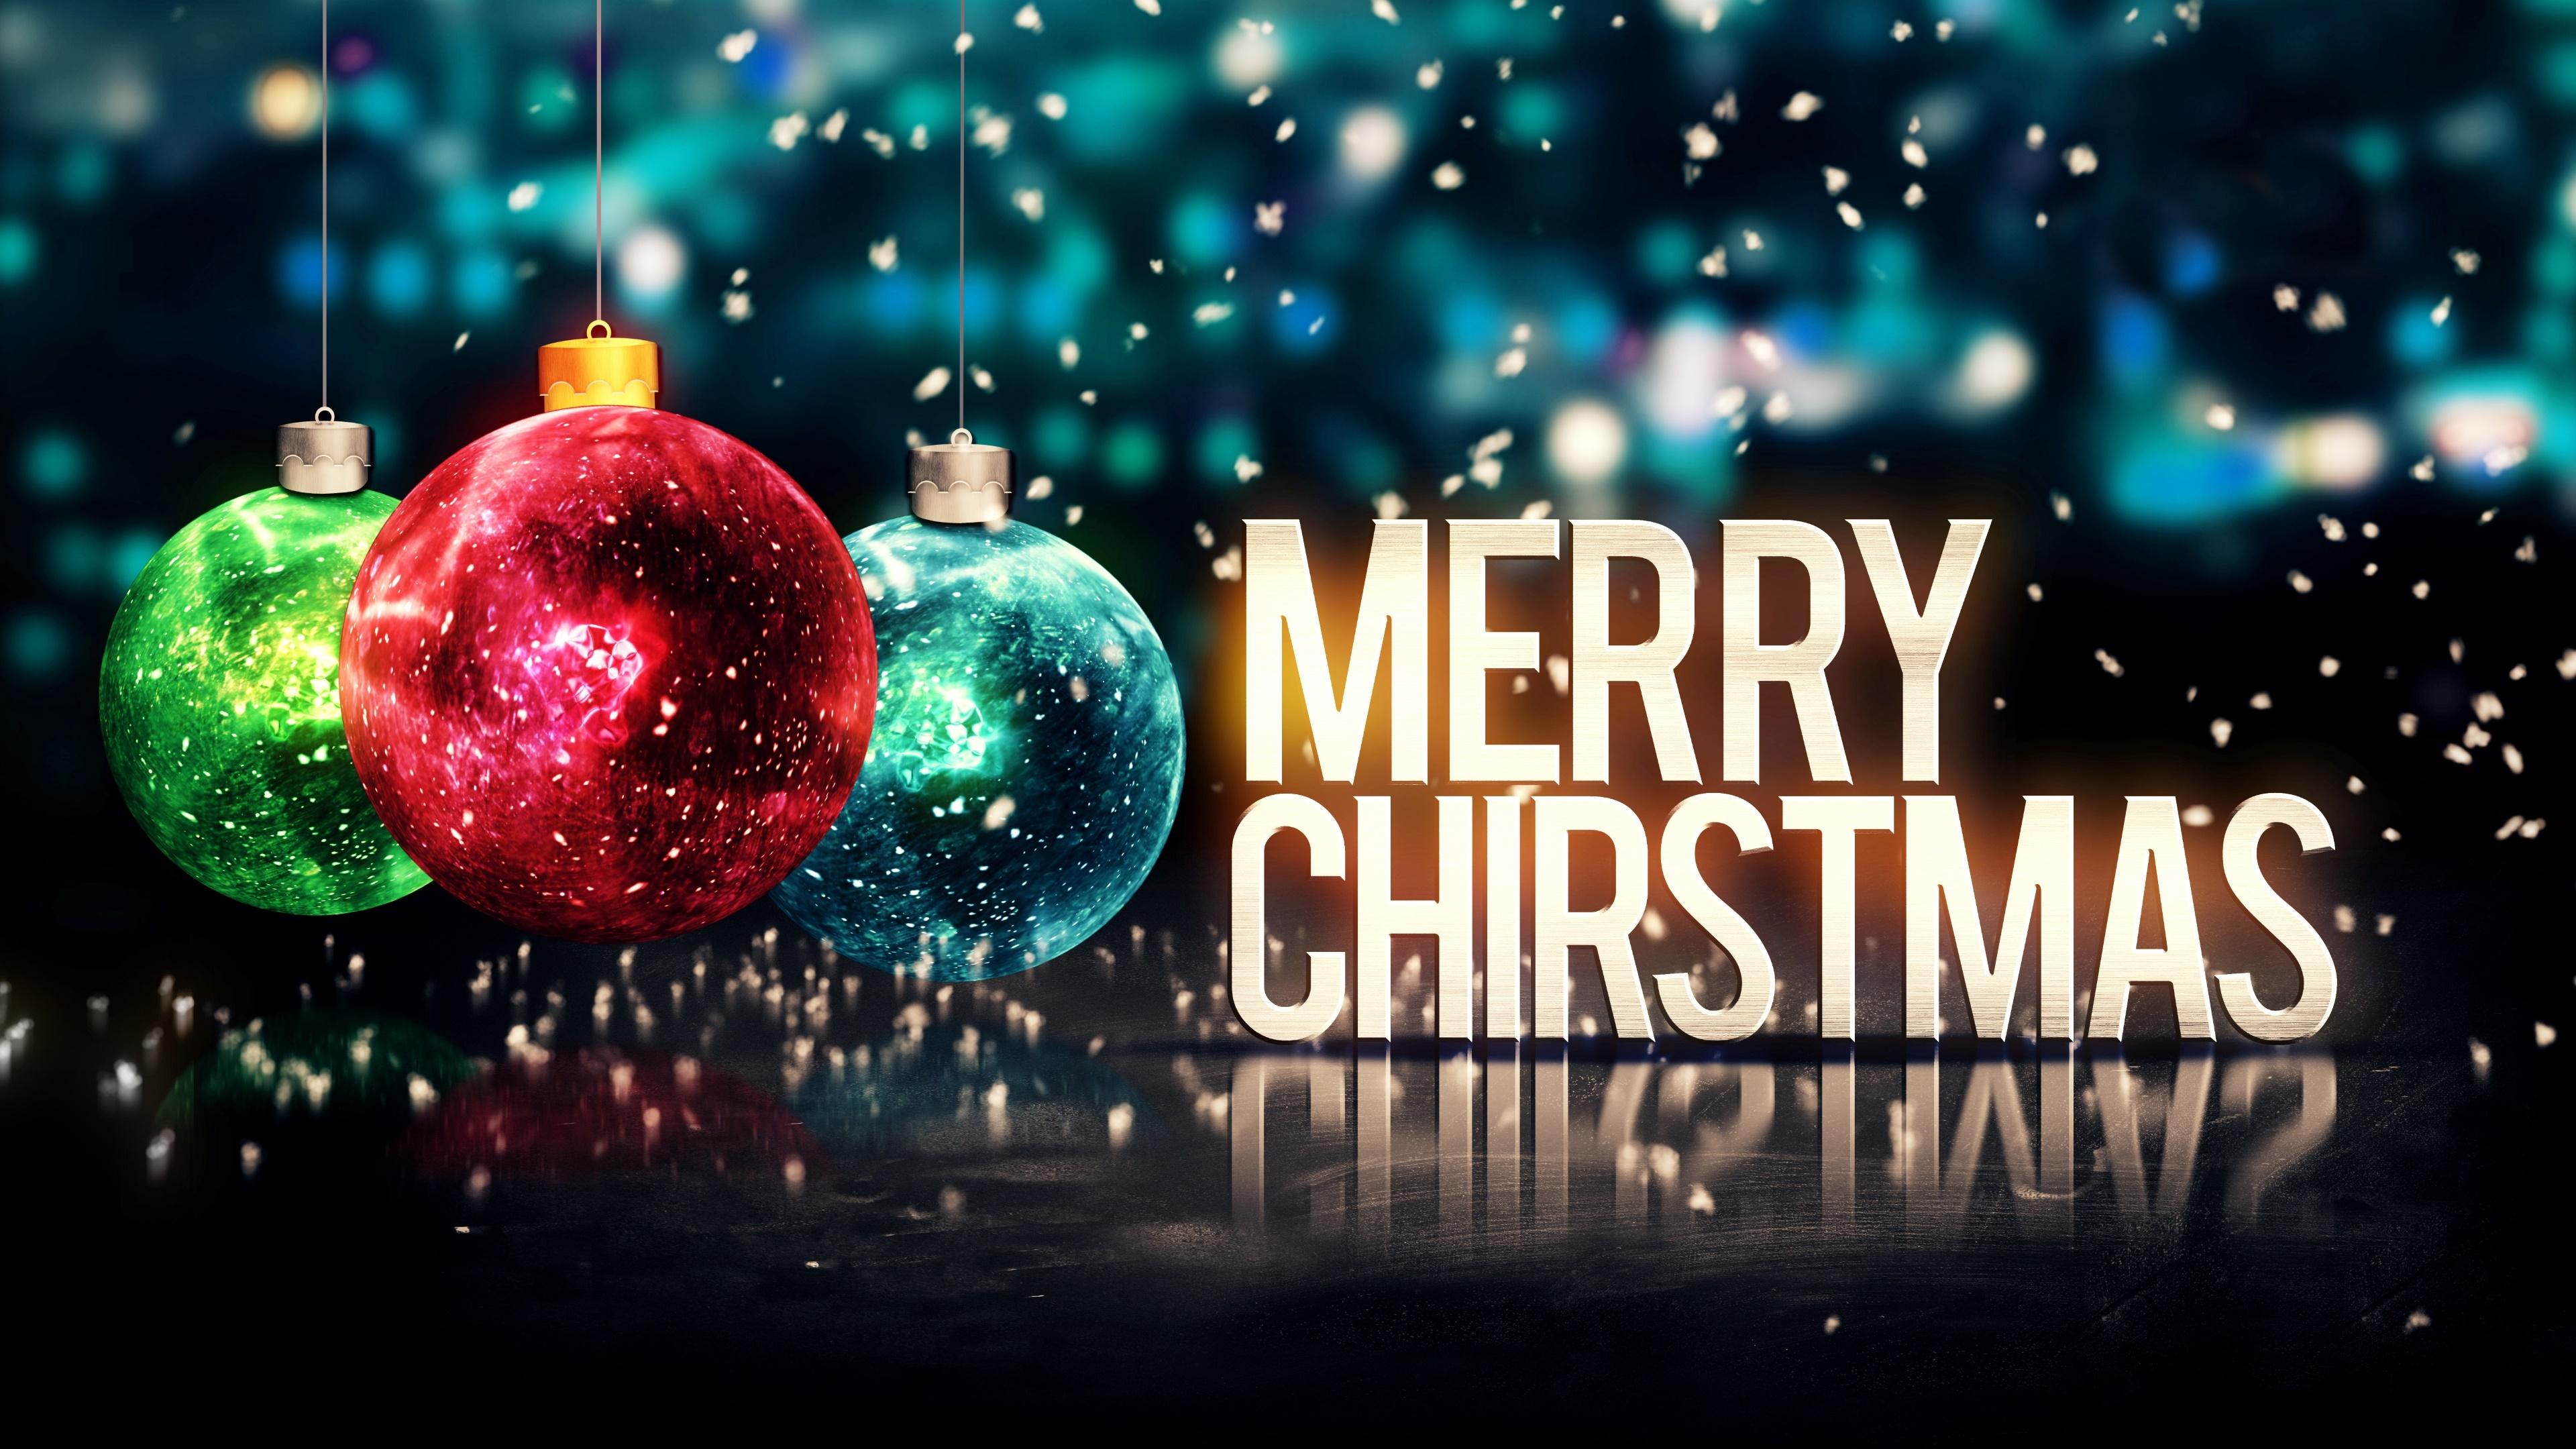 Christmas wallpaper hd for desktop - Merry Christmas 4k Uhd Wallpaper 3840x2160